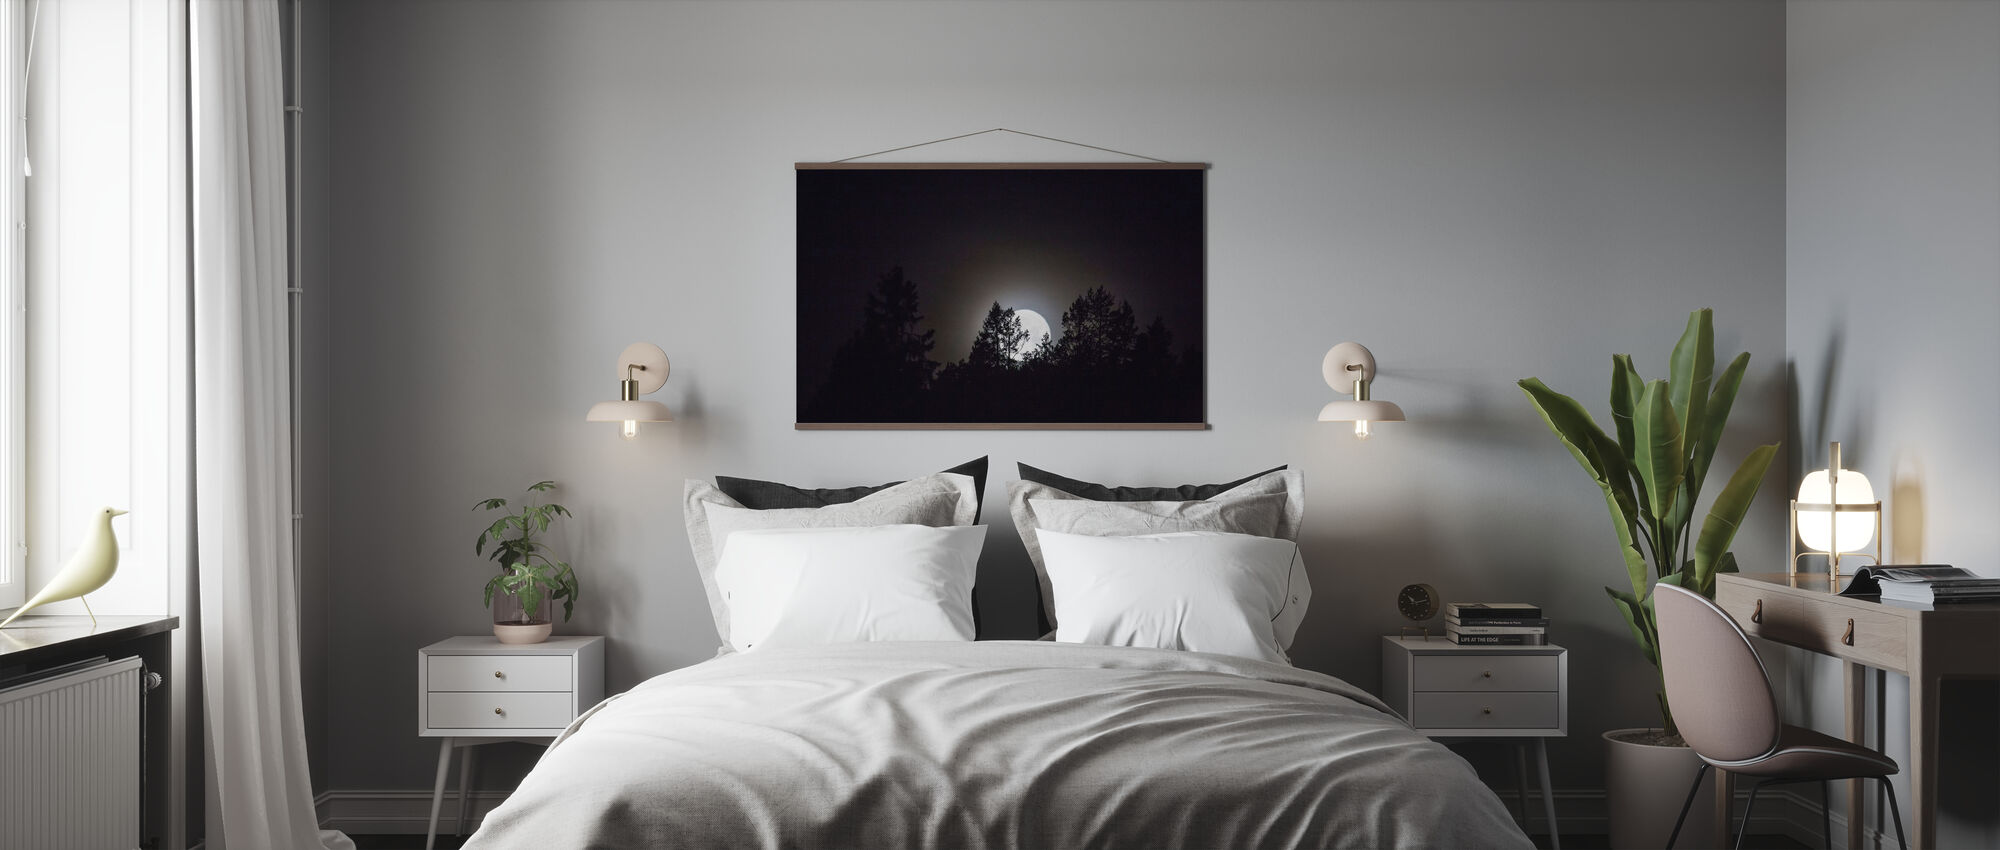 Moonlight over Medelpad, Sweden, Europe - Poster - Bedroom